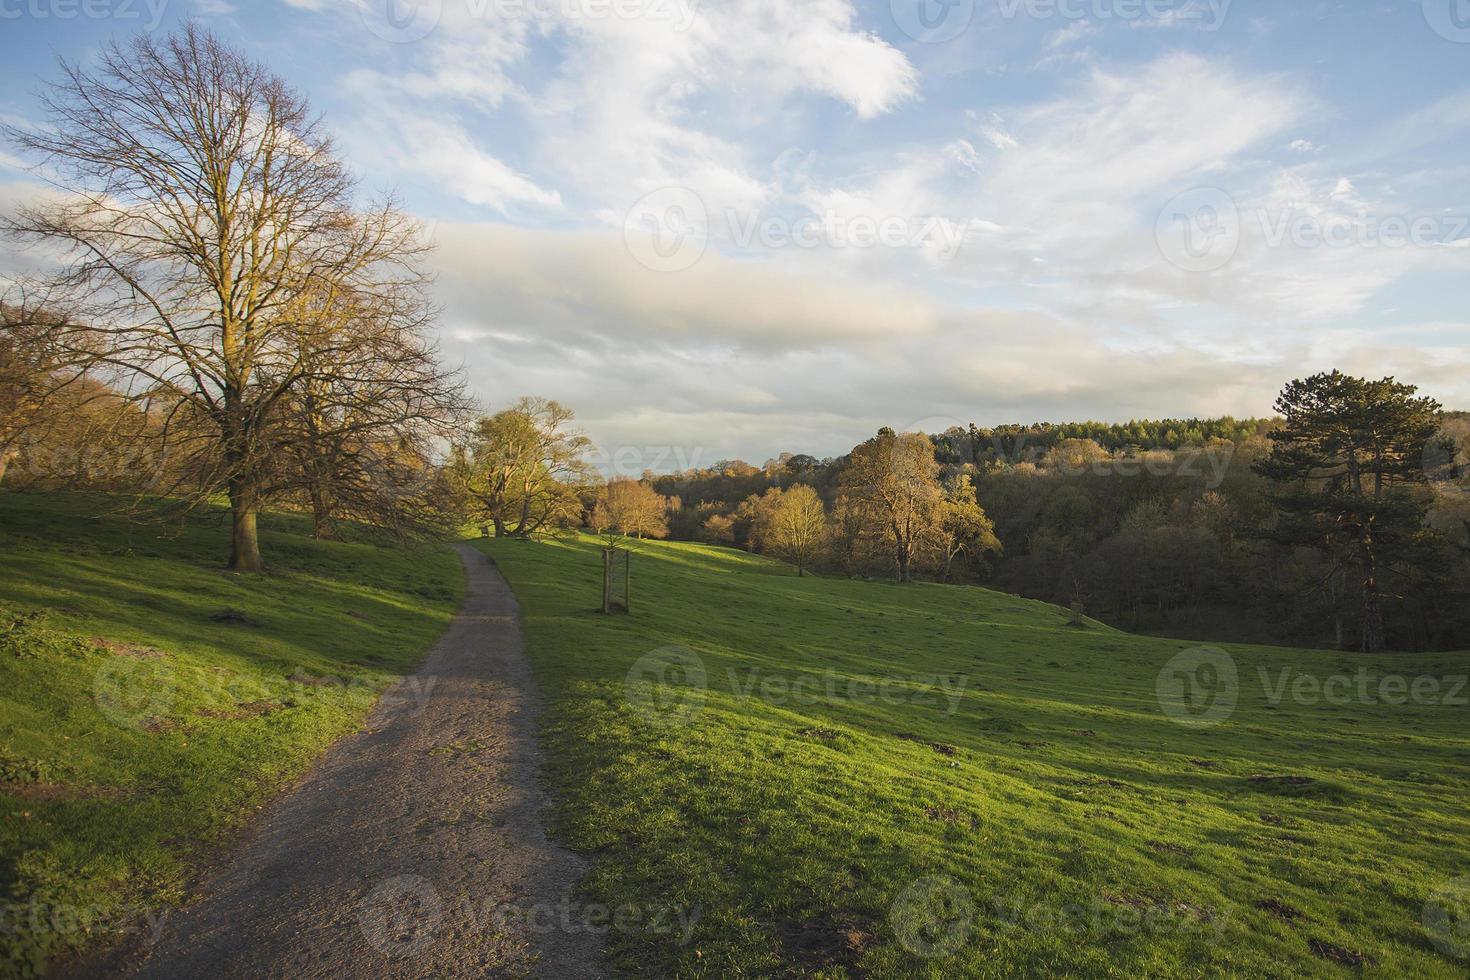 paisagem de um parque rural foto